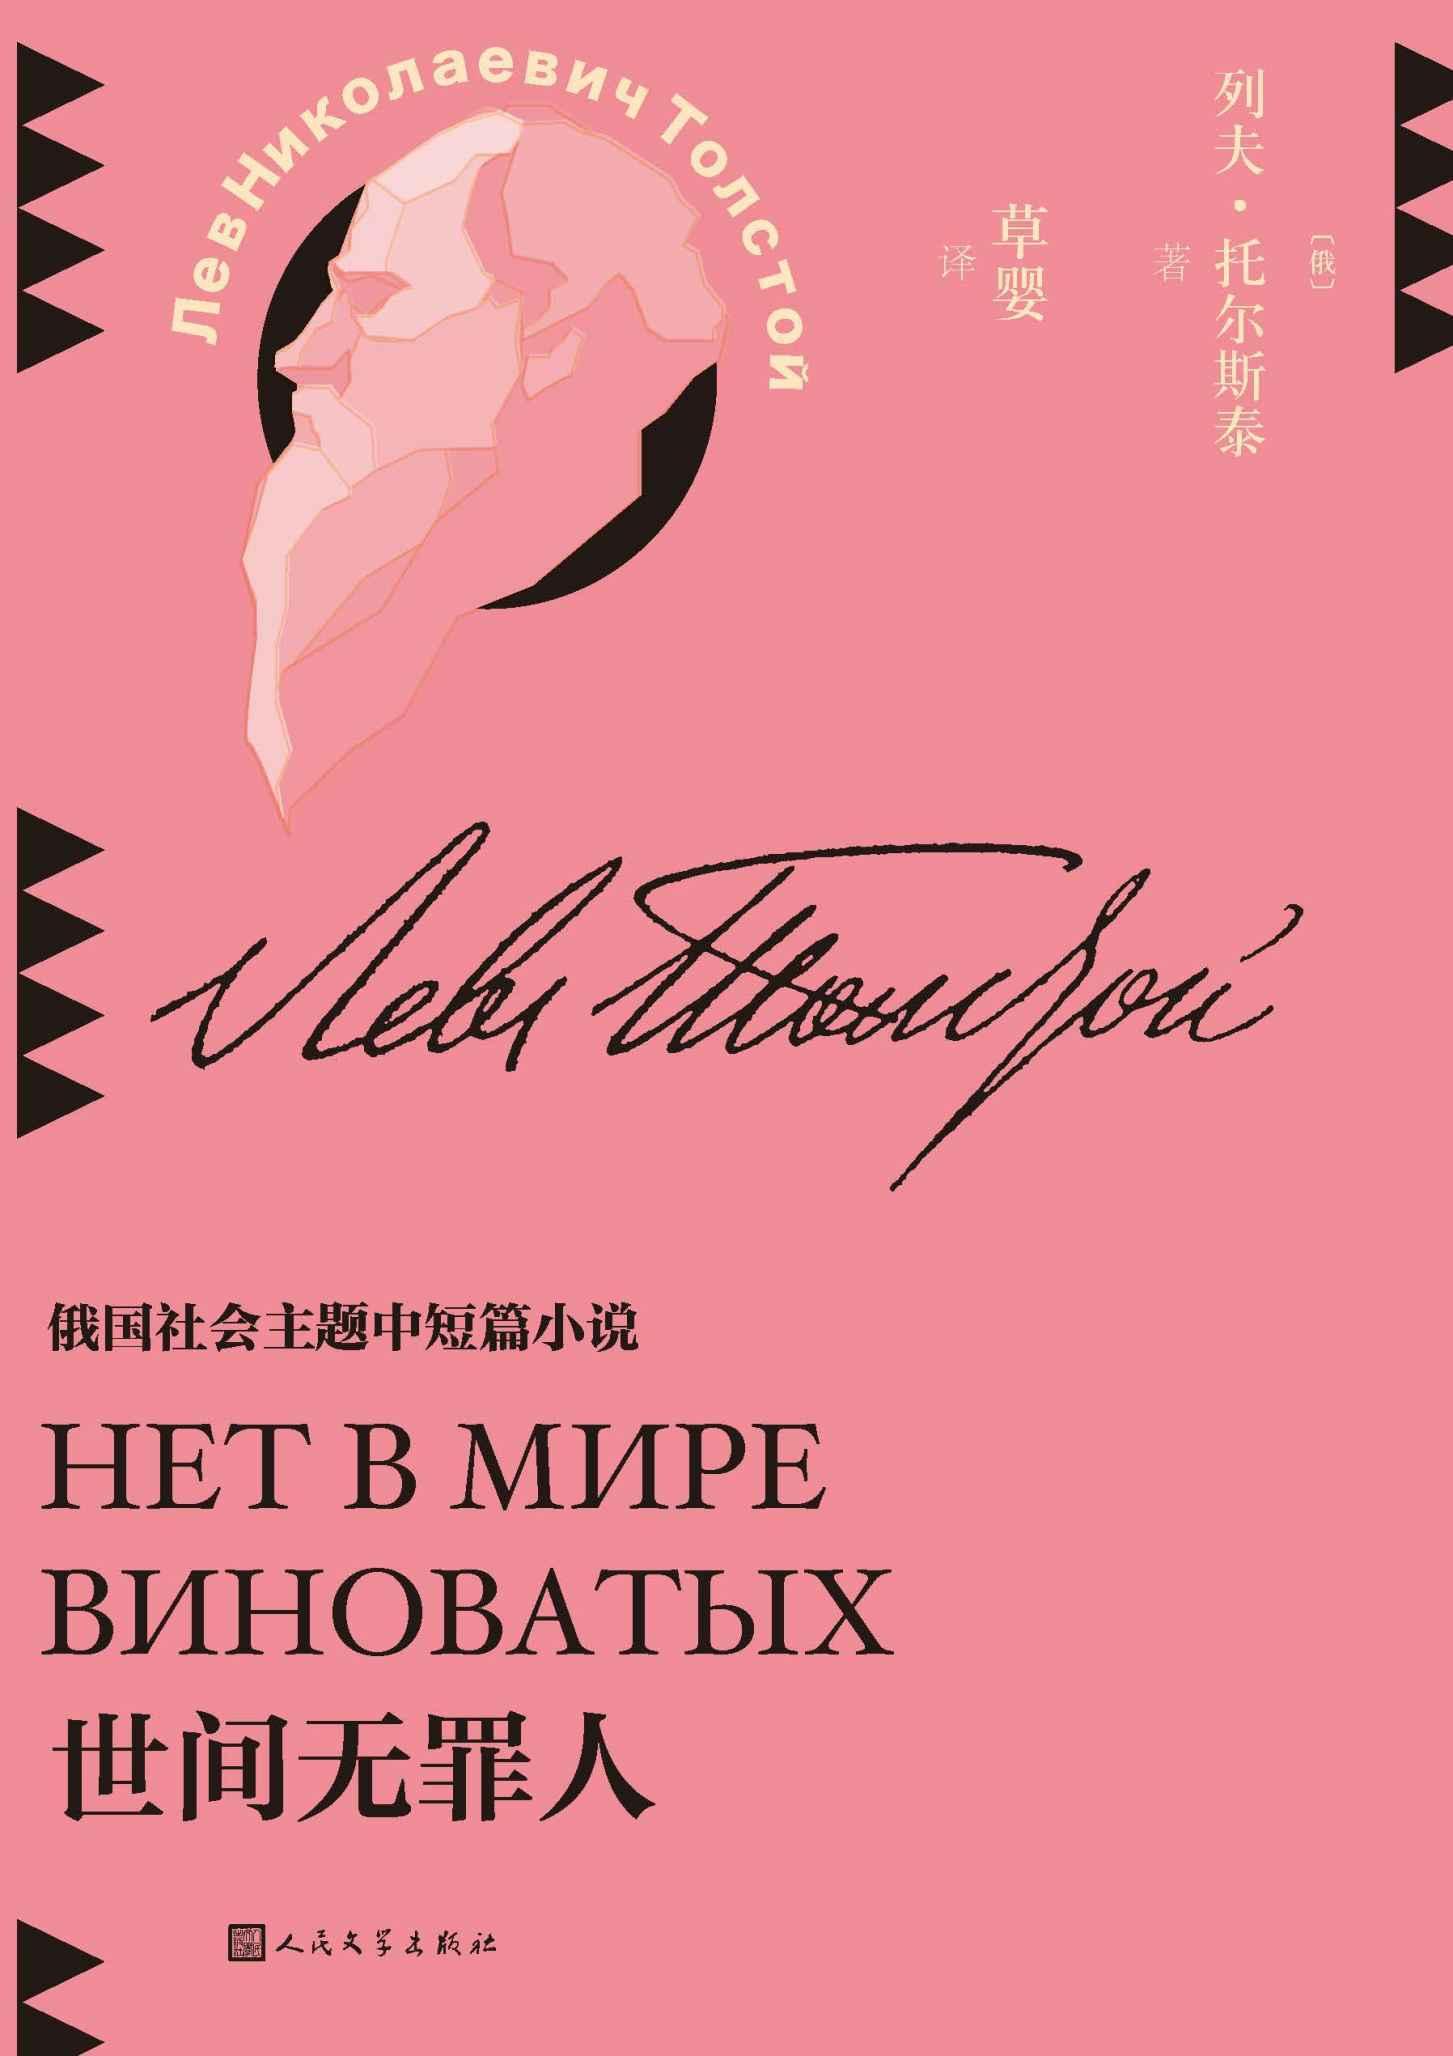 世间无罪人pdf-epub-mobi-txt-azw3